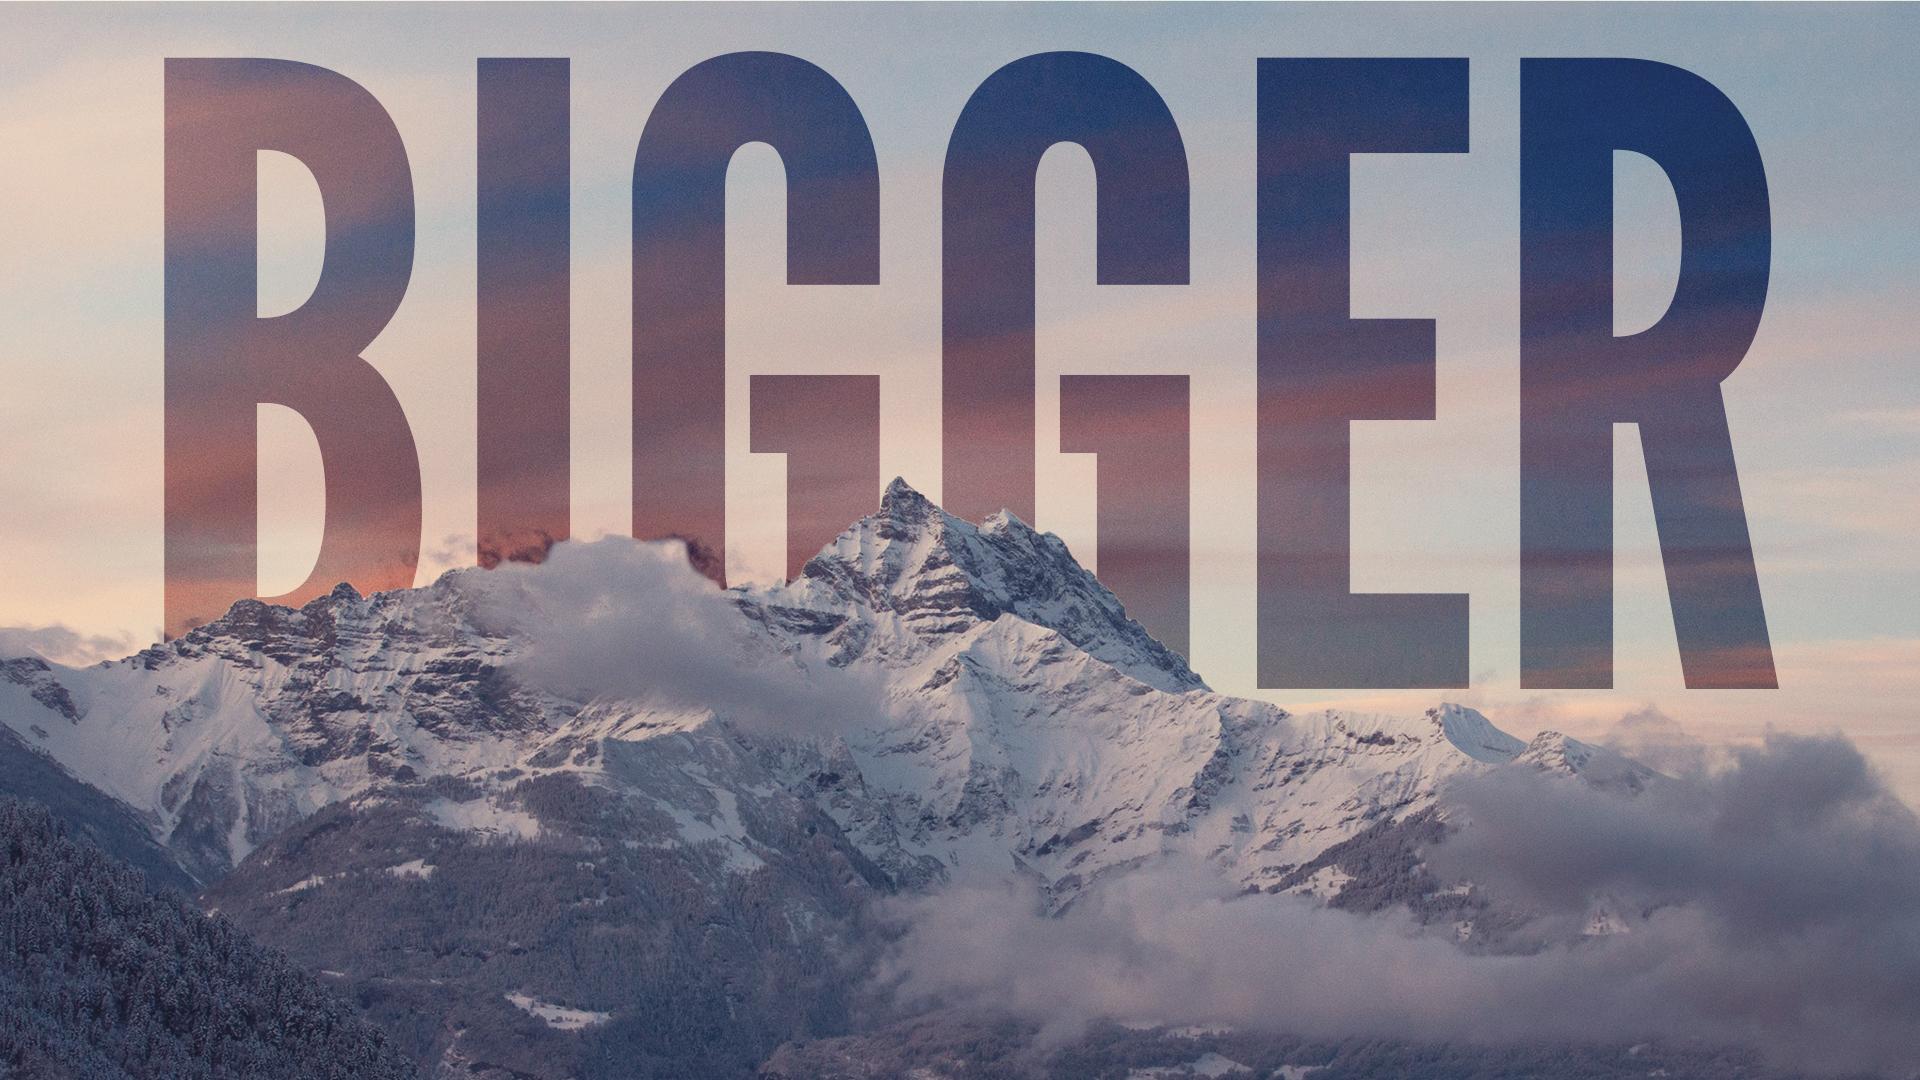 Bigger - A series in Hebrews